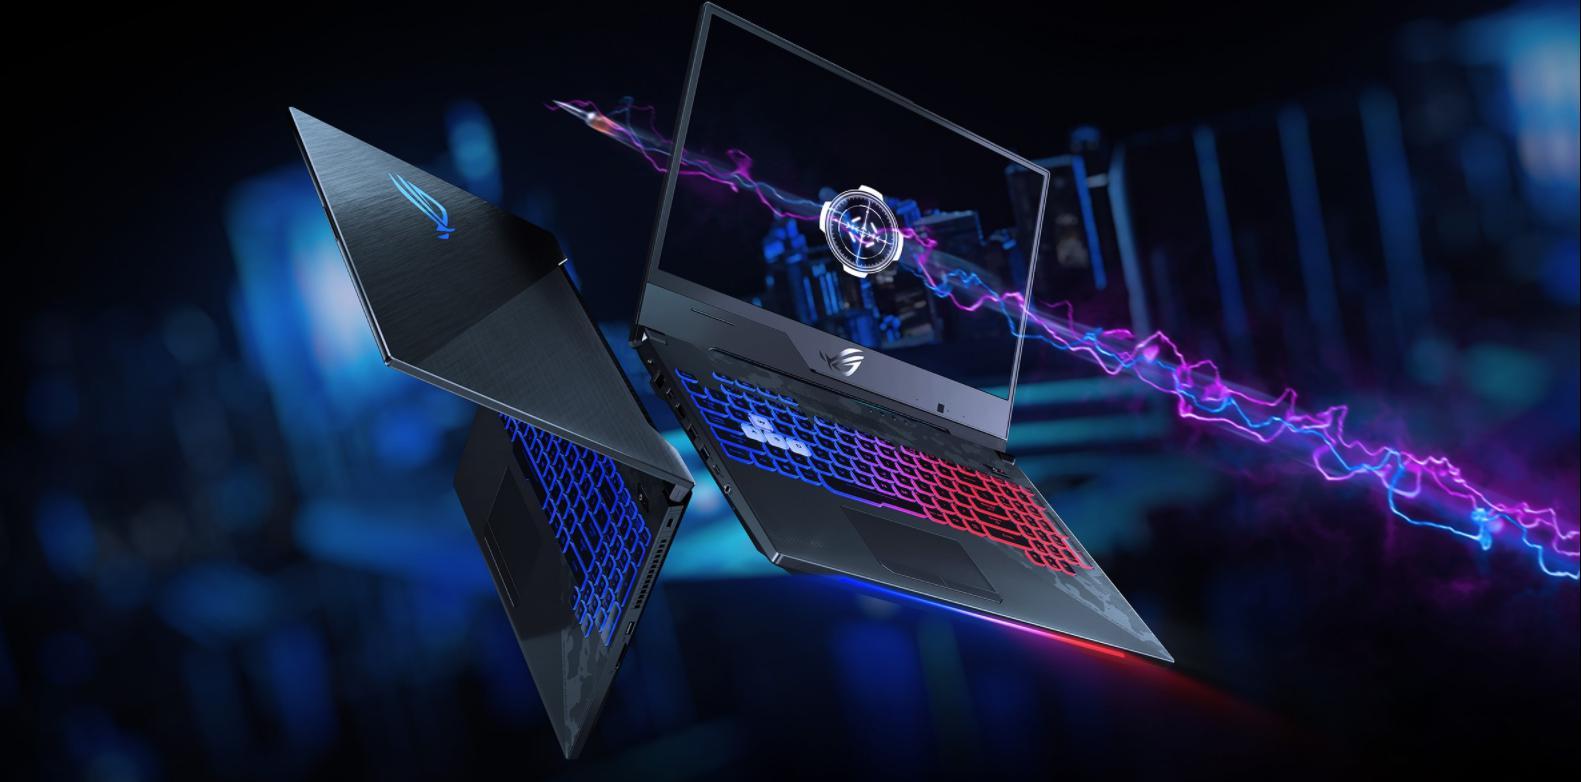 Đánh giá Laptop Asus ROG Strix Scar II GL504GM-ES312T 1